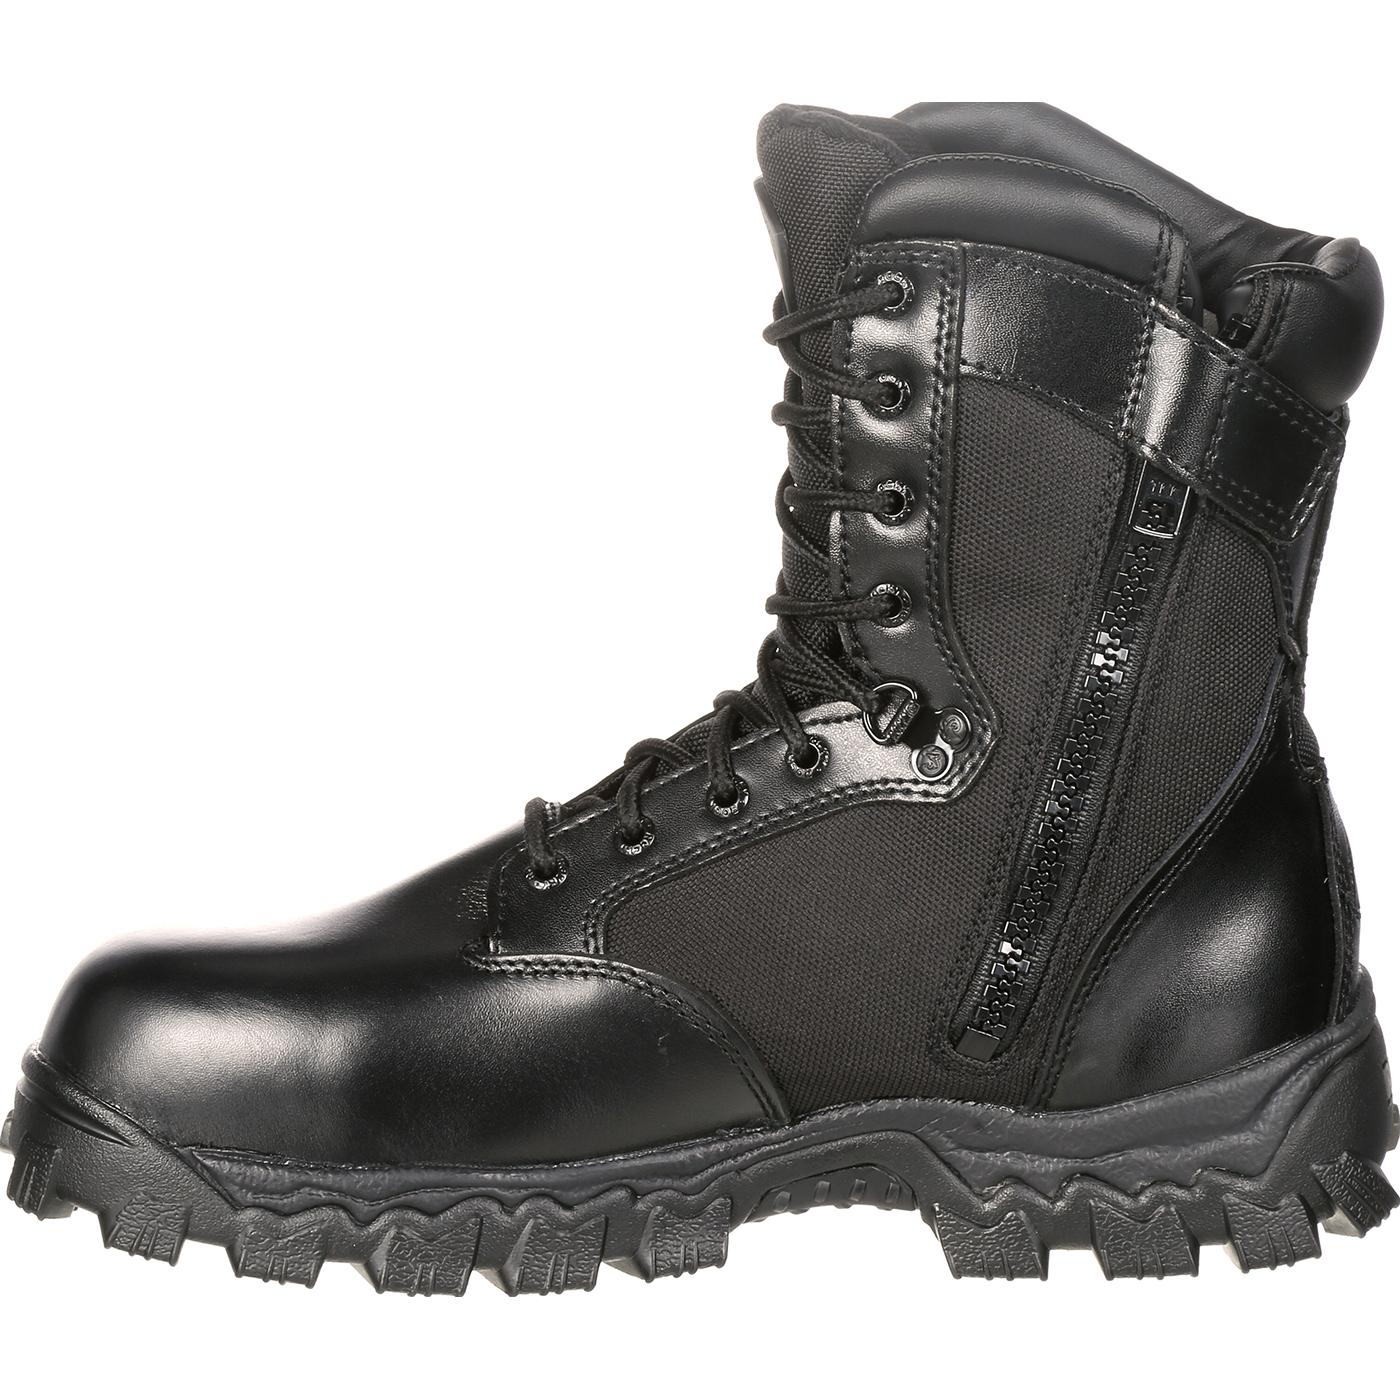 22dc0d1ba3bd Rocky AlphaForce Zipper Composite Toe Waterproof Duty Boot  6173